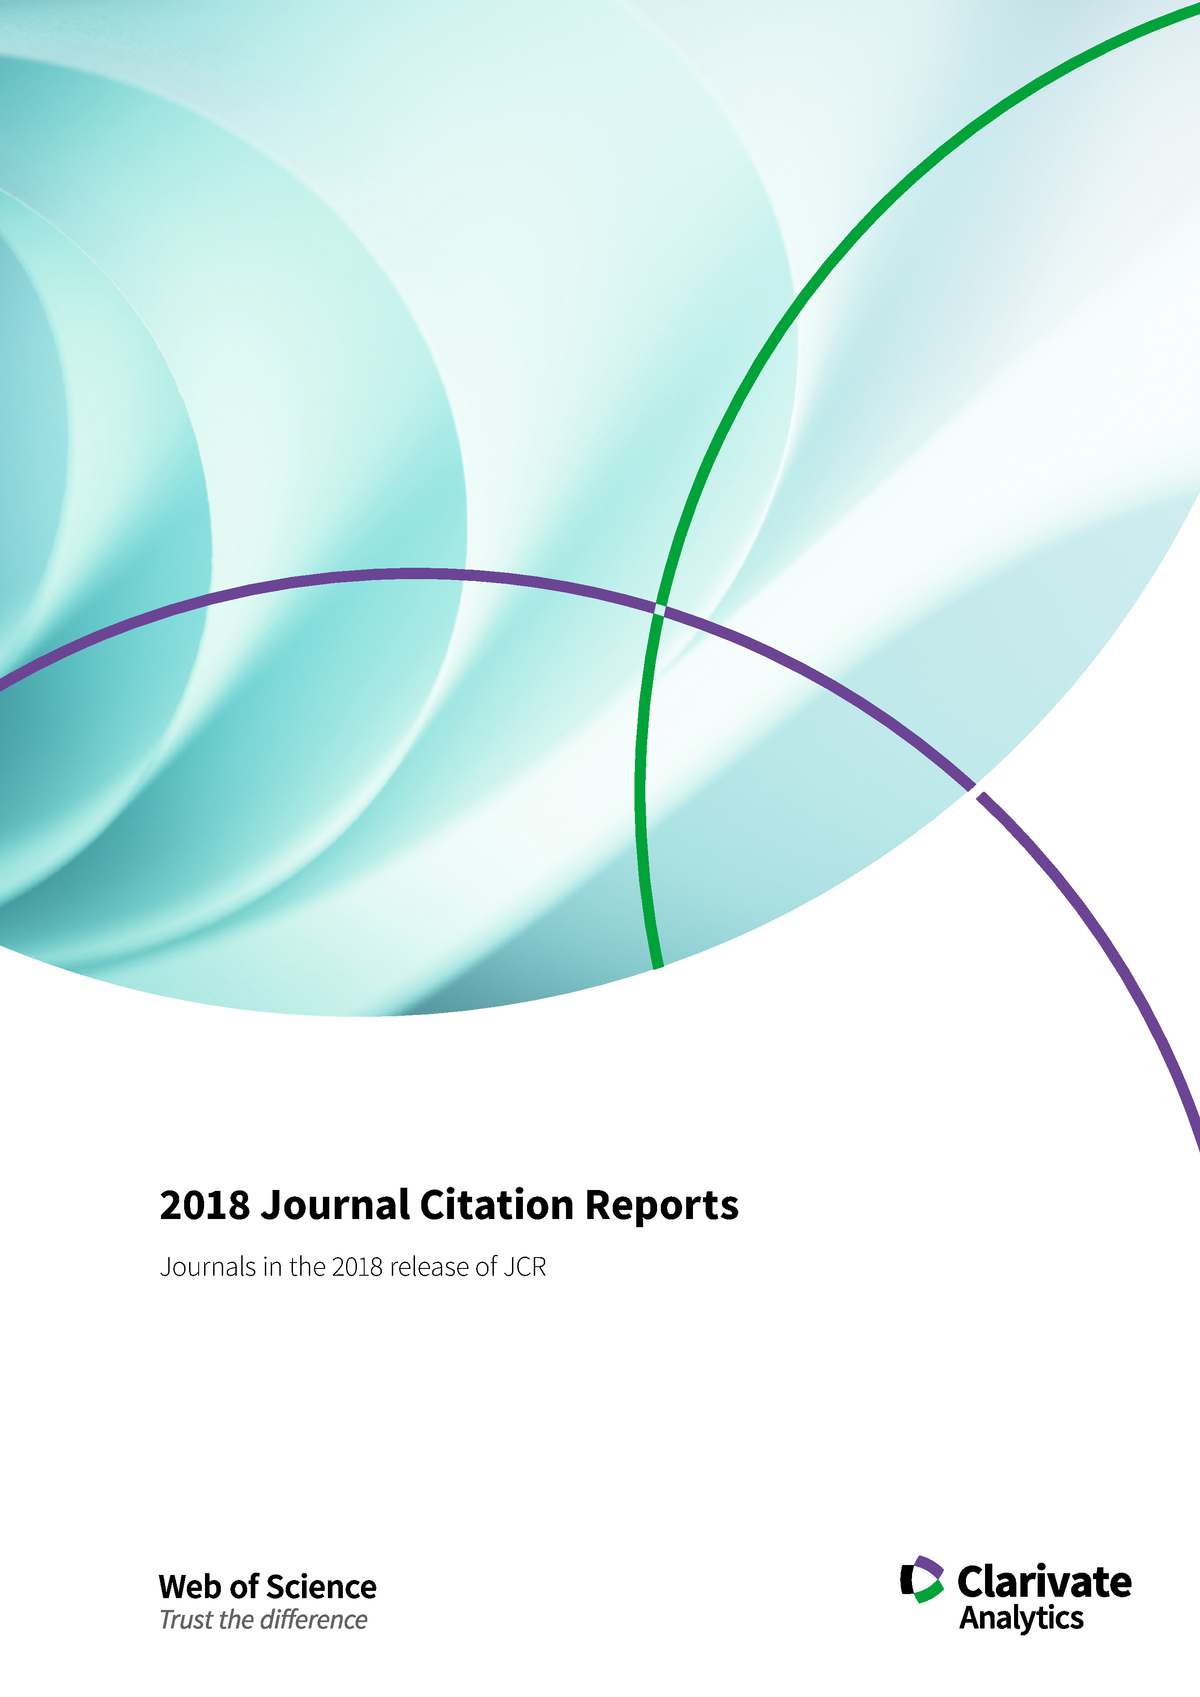 Crv JCR Full-Marketing-List A4 2018 v4 - Režija Baštine